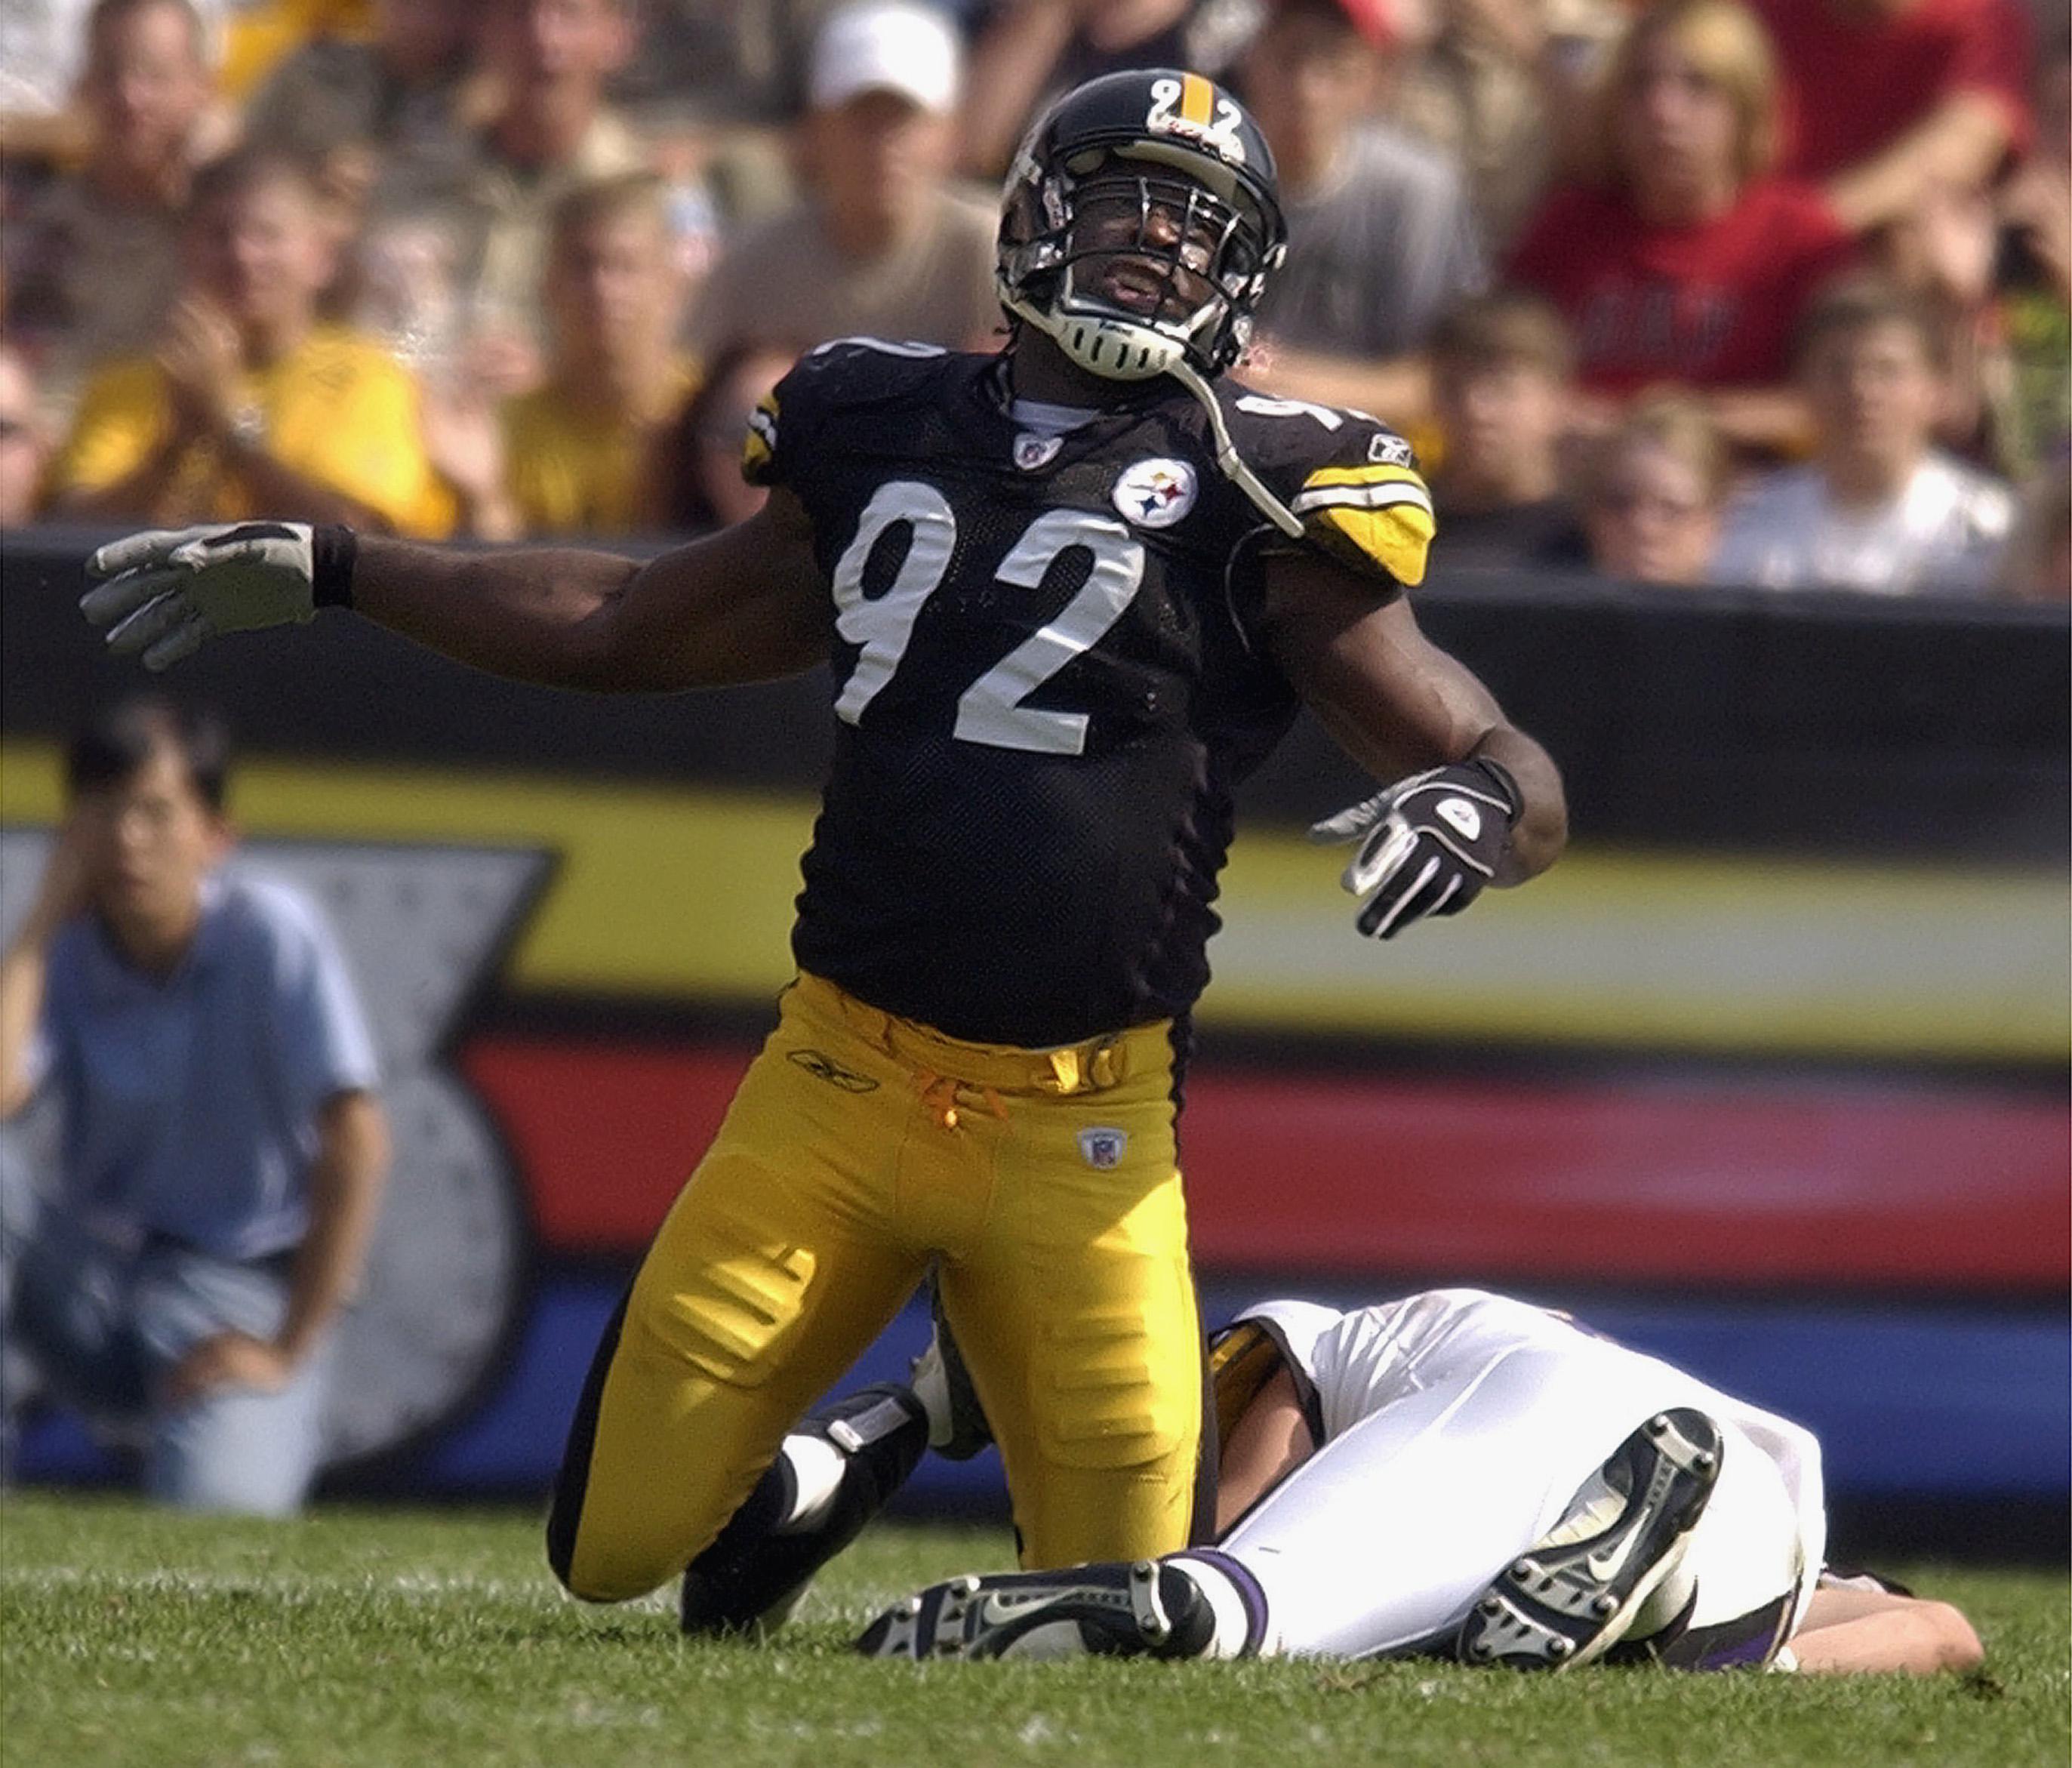 99634c3e8 PITTSBURGH - SEPTEMBER 7  Linebacker Jason Gildon  92 of the Pittsburgh  Steelers celebrates a